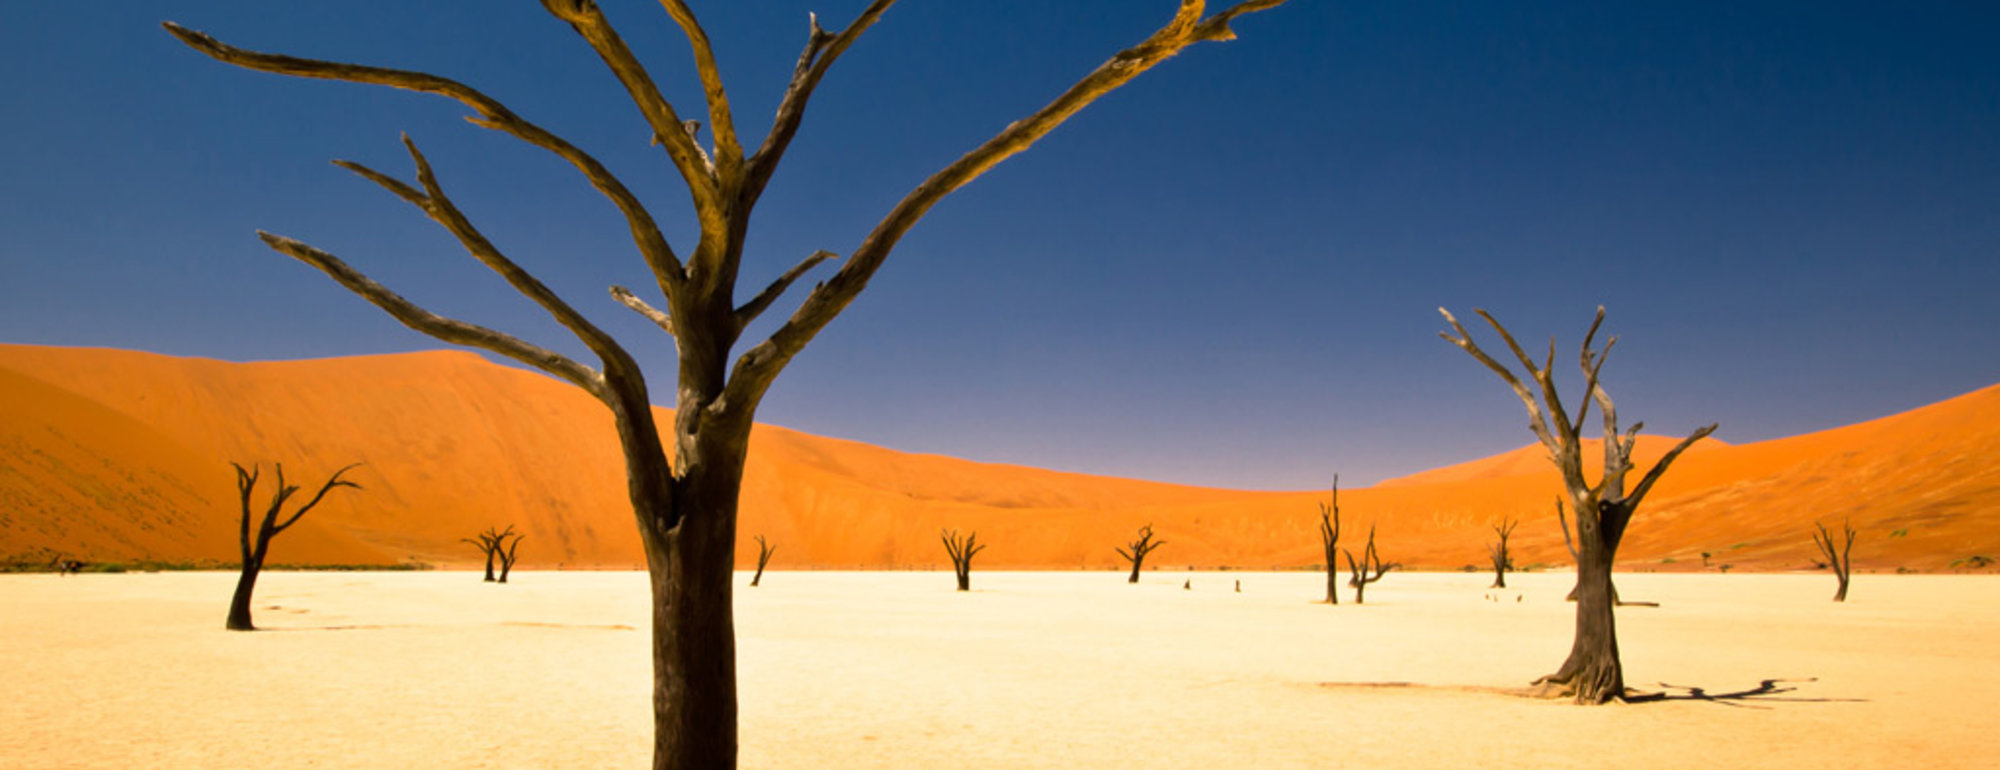 Sossusvlei-Dry-Trees-Wallpapers